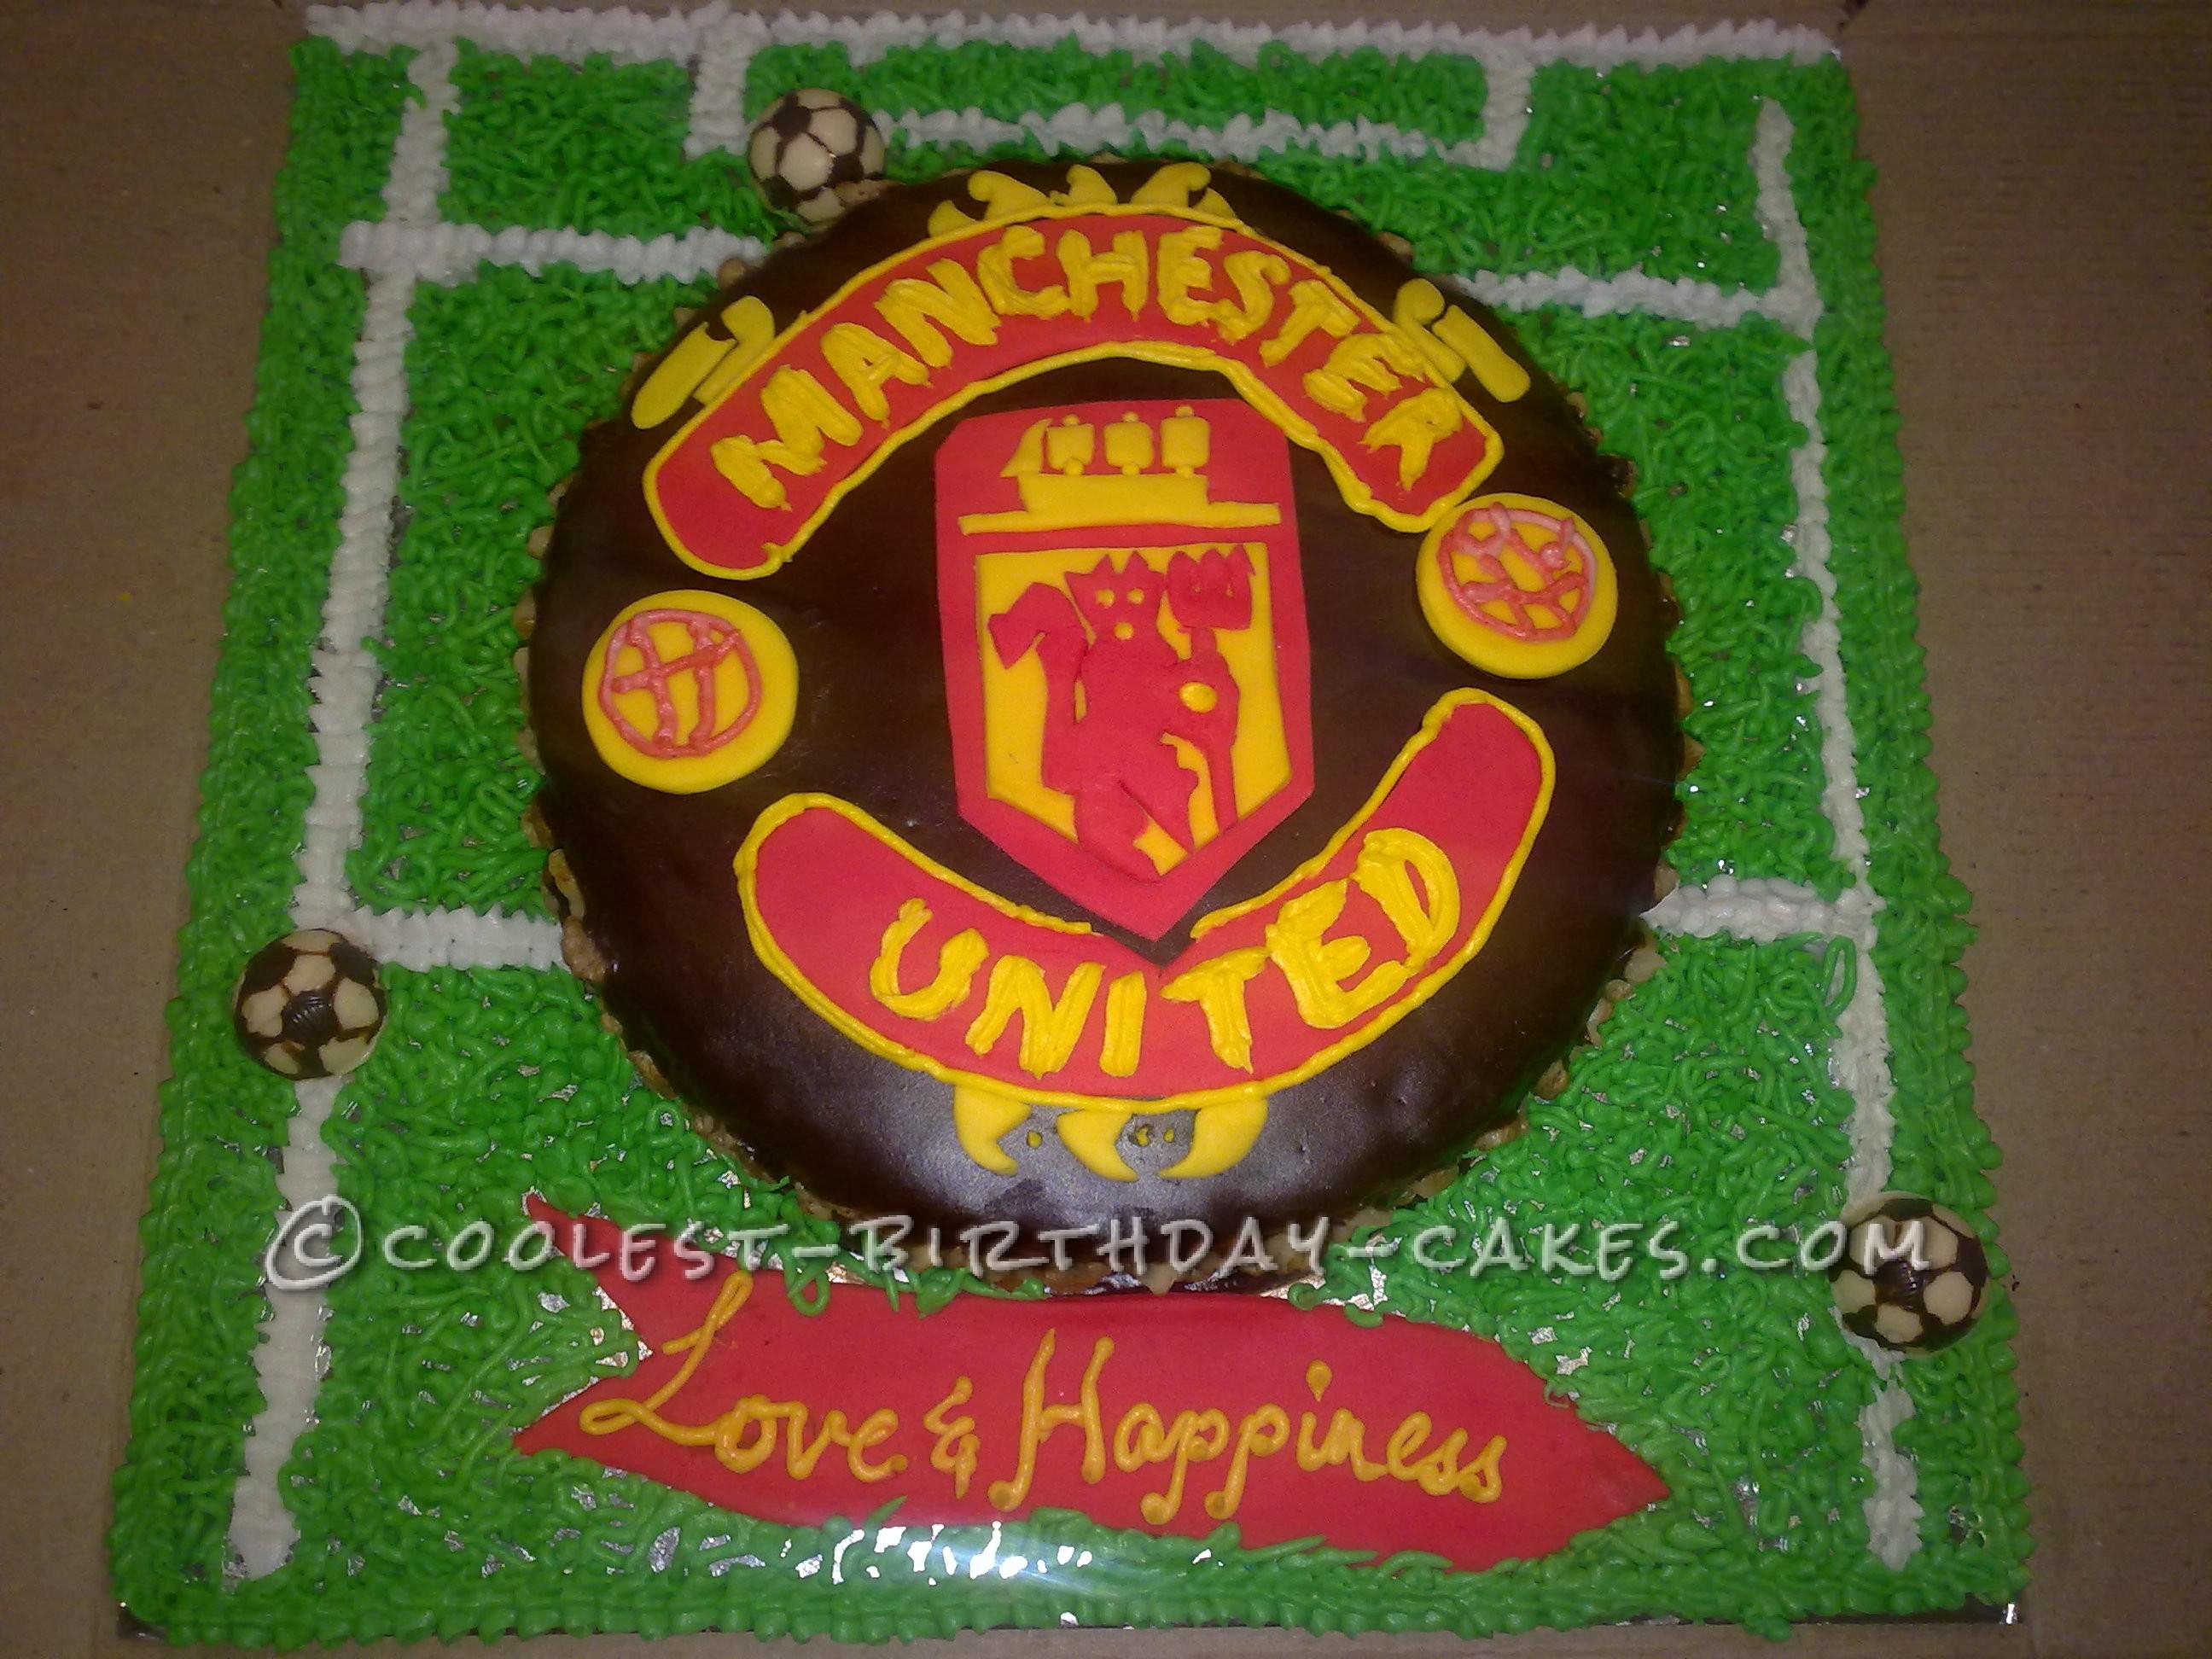 Awesome Manchester United Cake